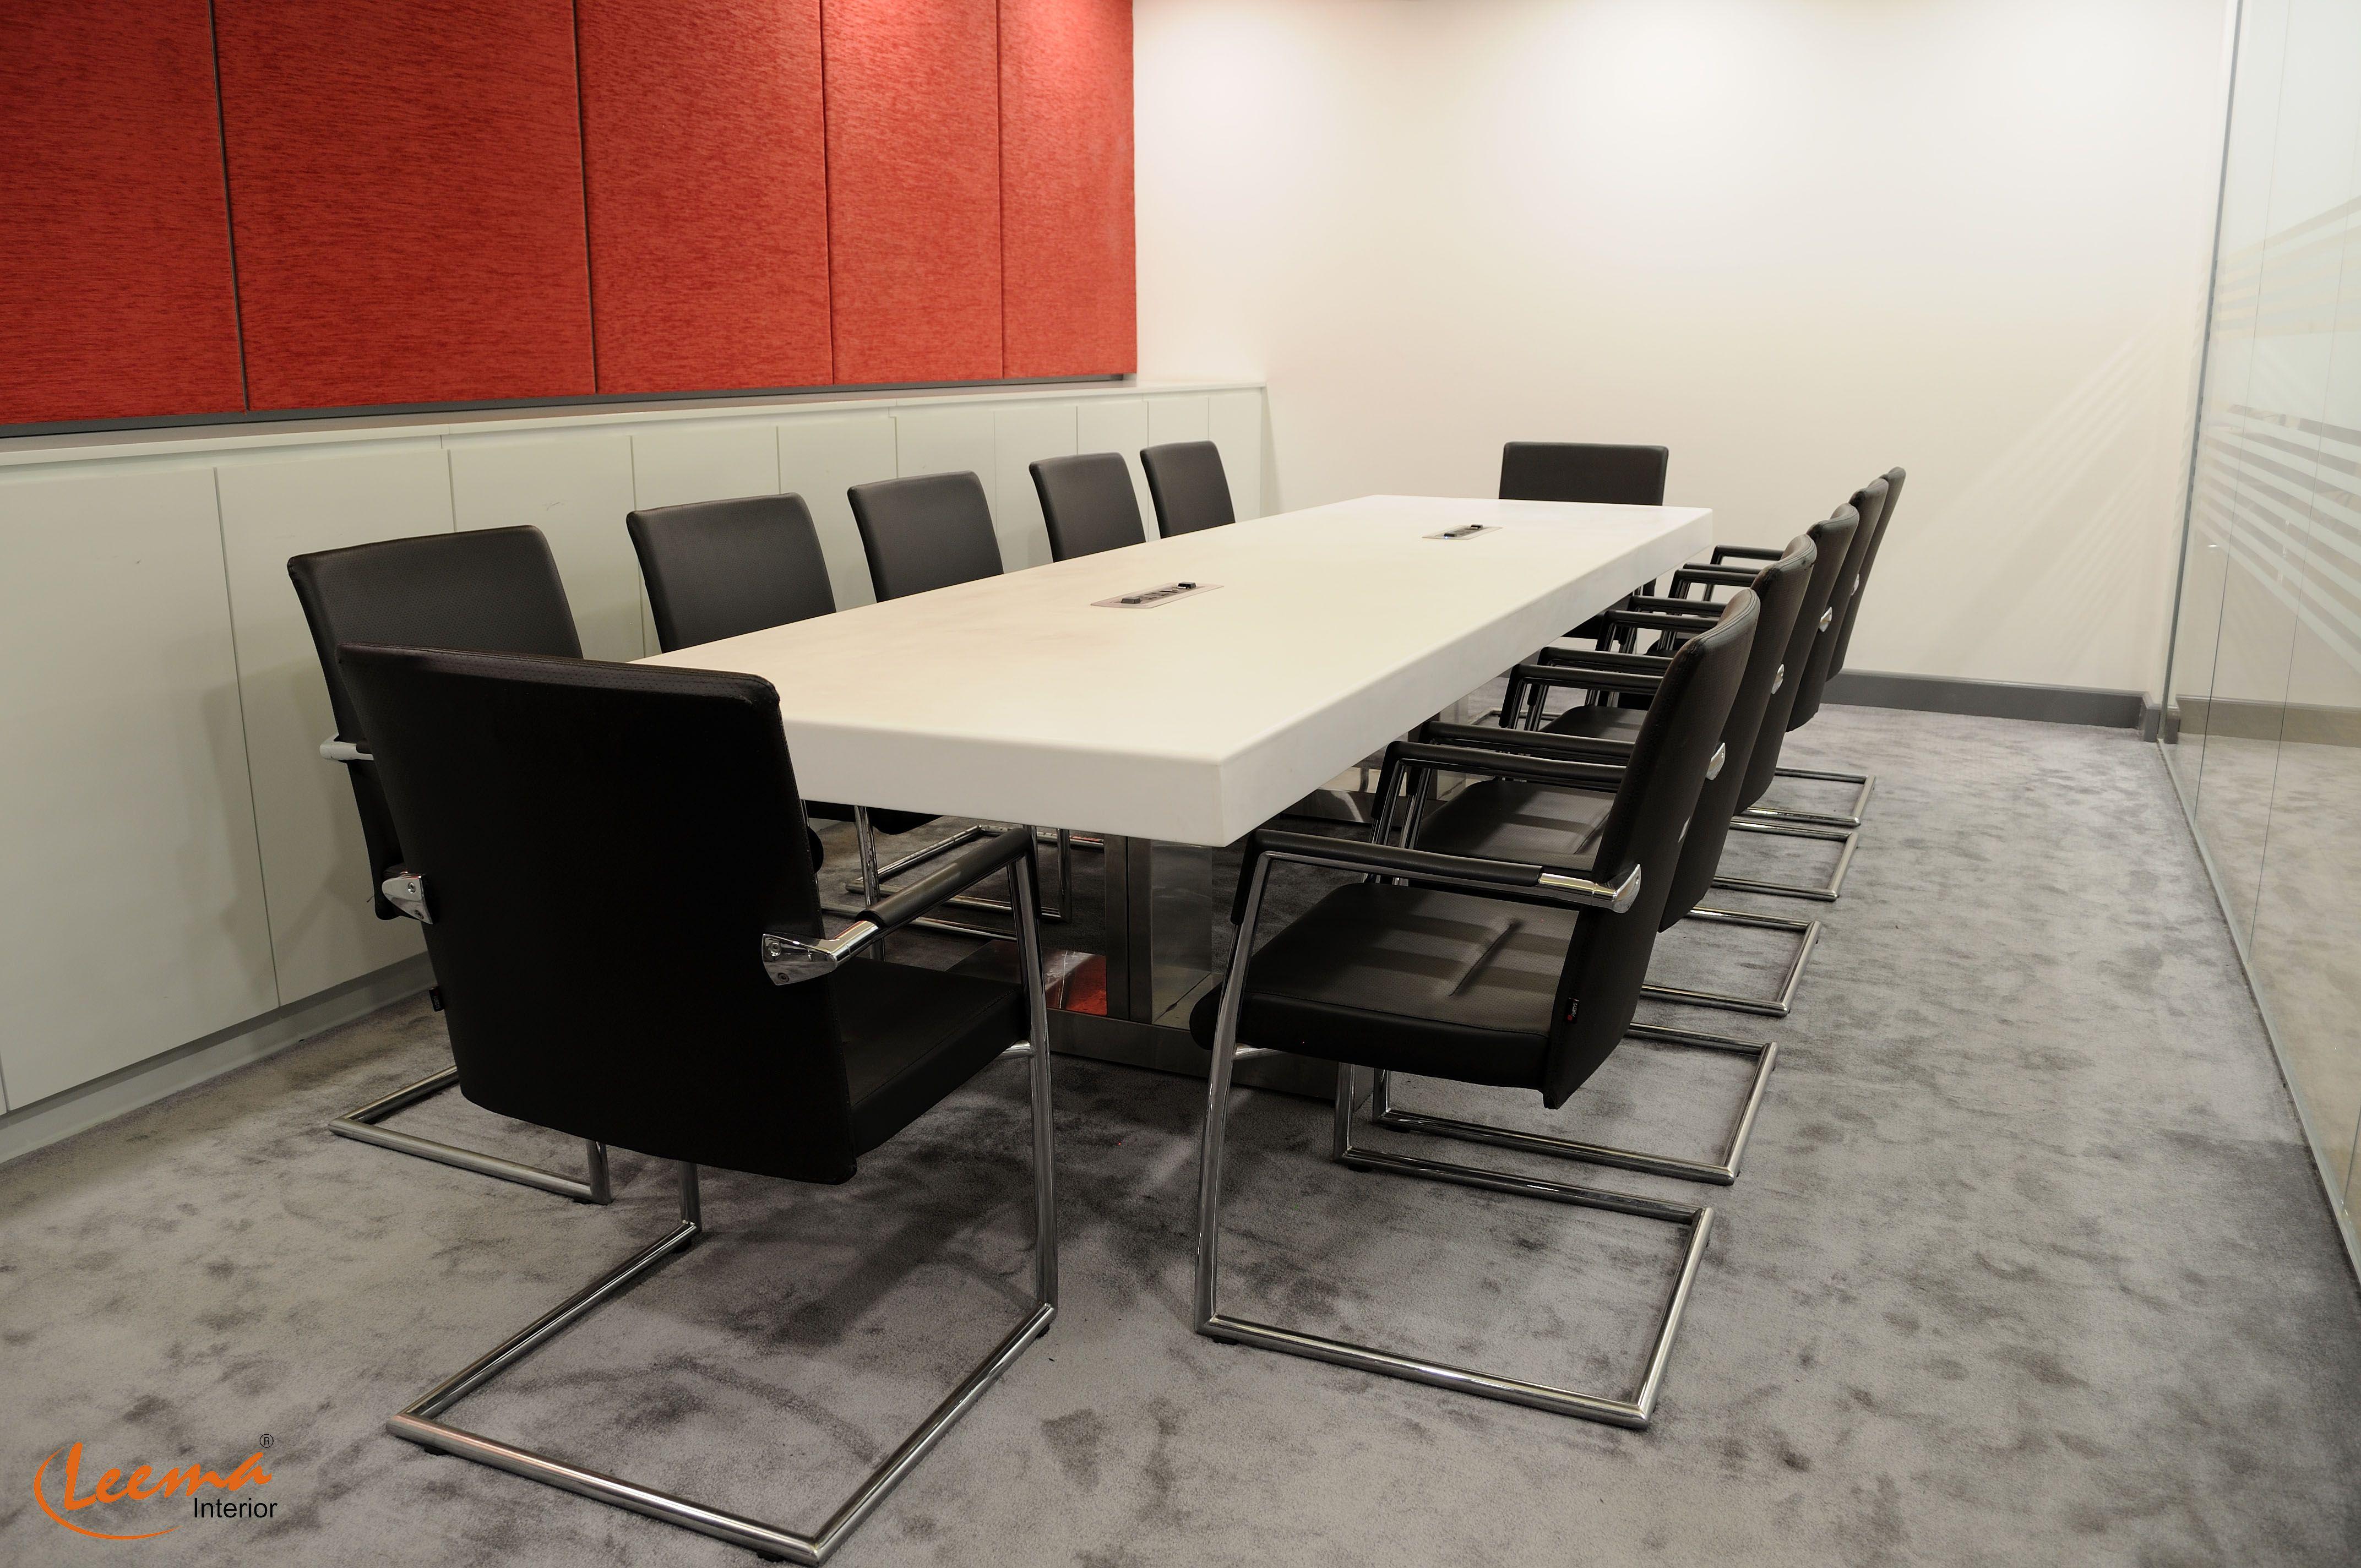 Dialog Sri Lanka Head Office Interior Decoration Design Chairs Furniture